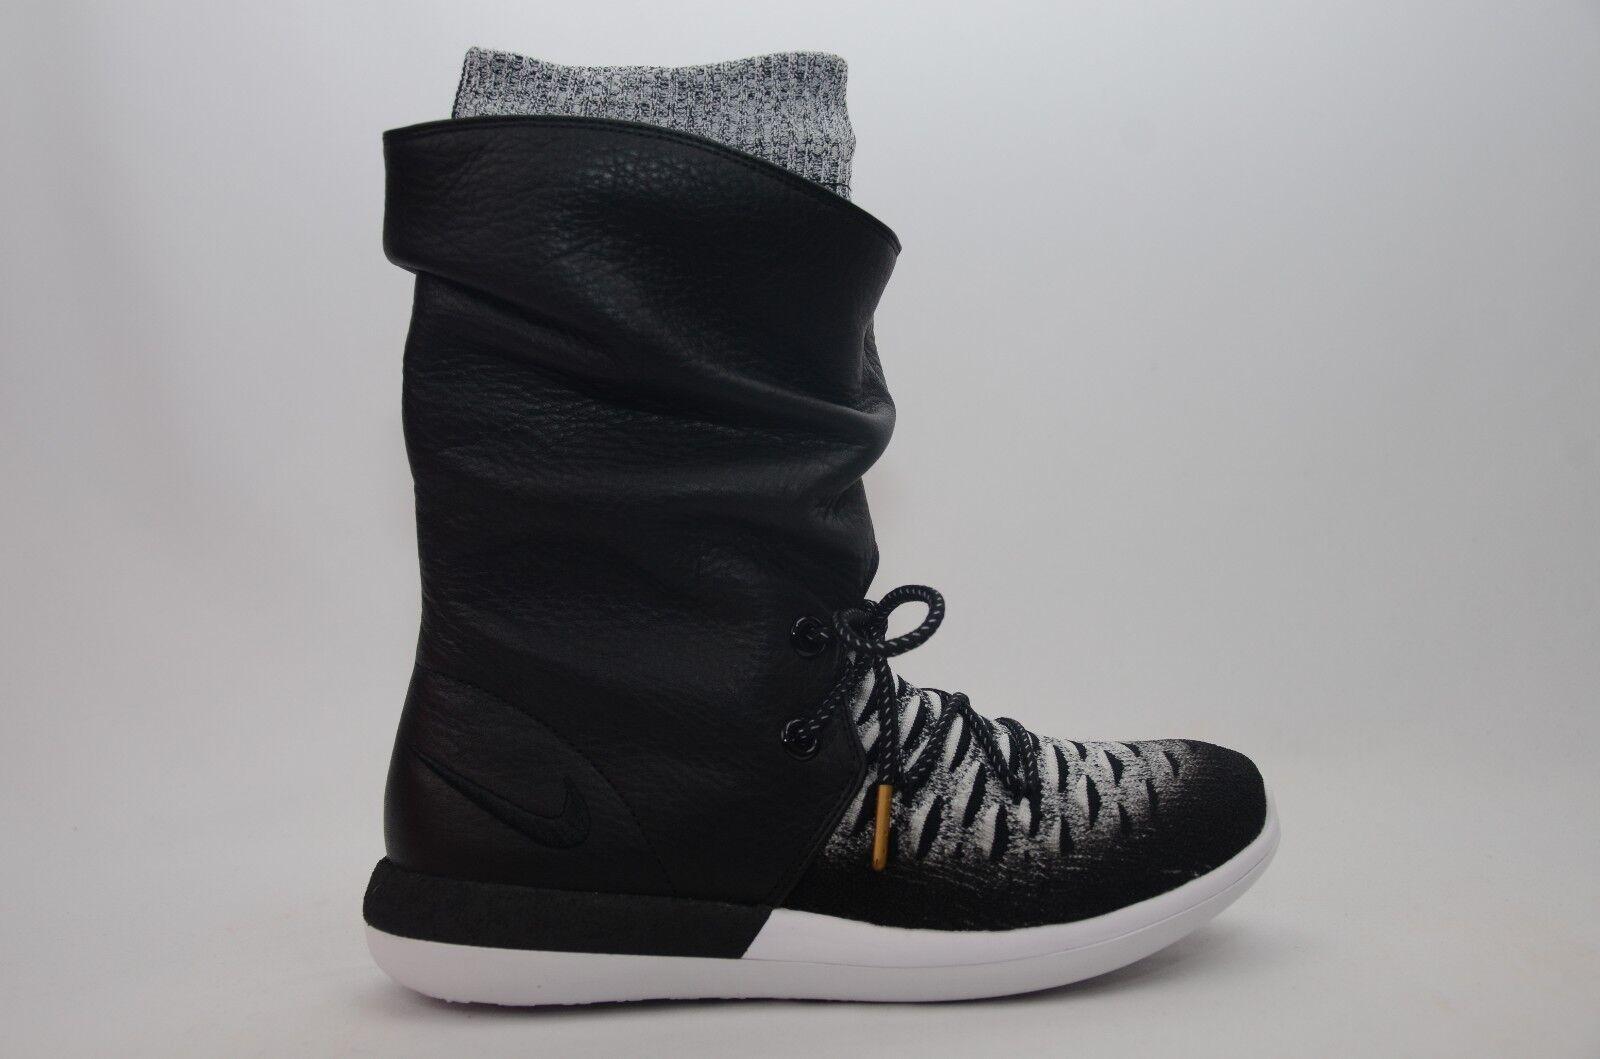 Nike Roshe Two Hi Flyknit Black/White Women's Size 7.5-12 New in Box 861708 002